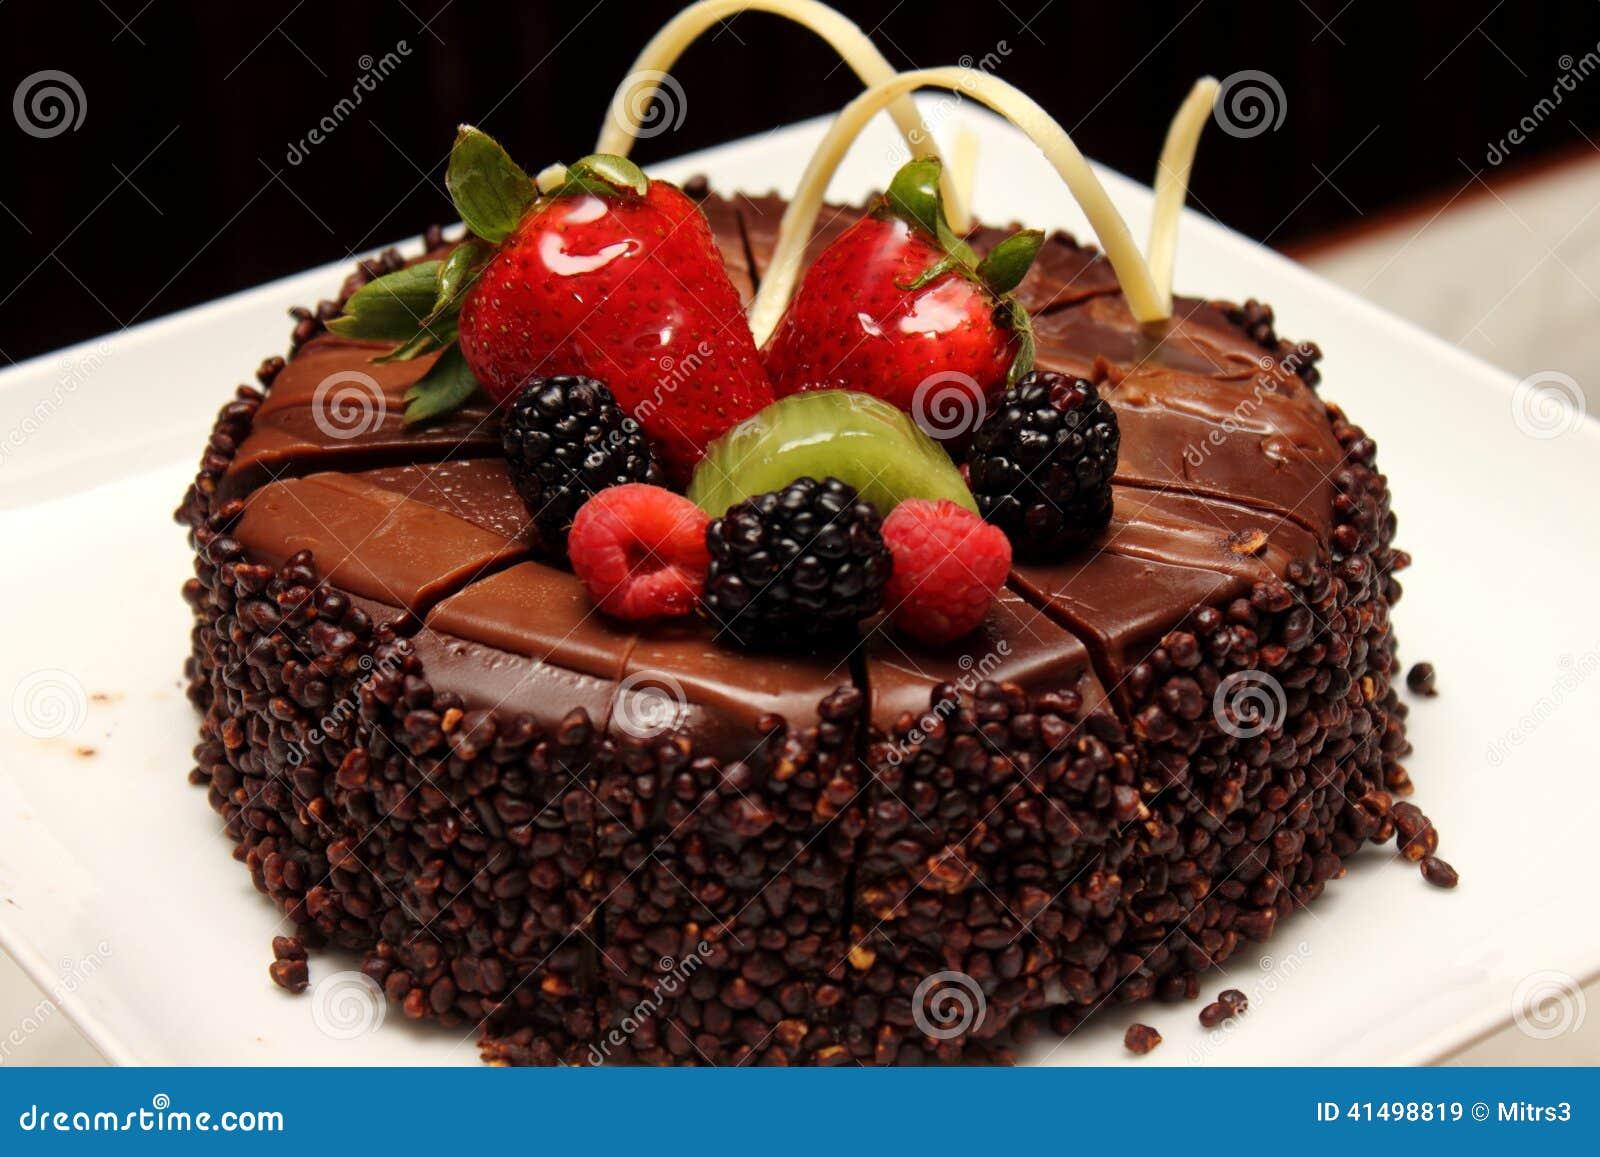 Simple Decoration For Fruit Cake : Chocolate Cake With Fresh Fruit Decoration. Stock Photo ...